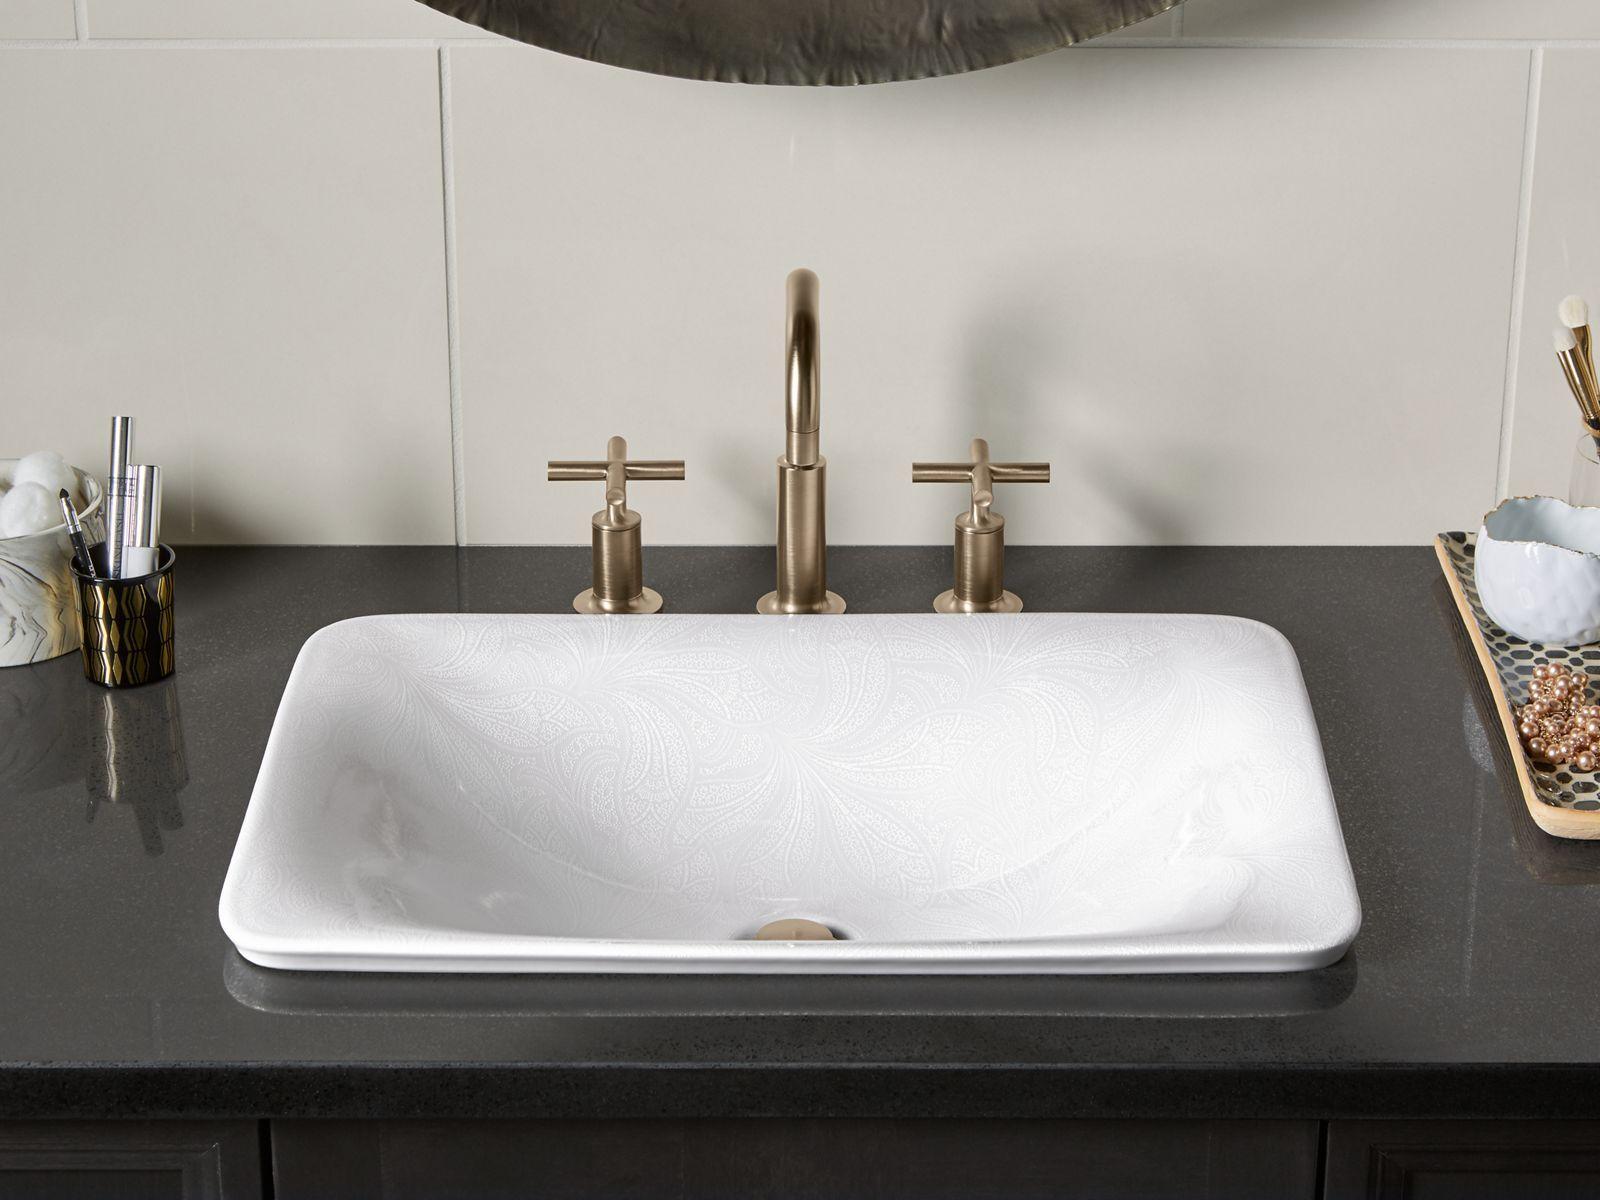 Bathroom Sink Buying Guide Kohler With Images Small Bathroom Sinks Sink Bathroom Sink